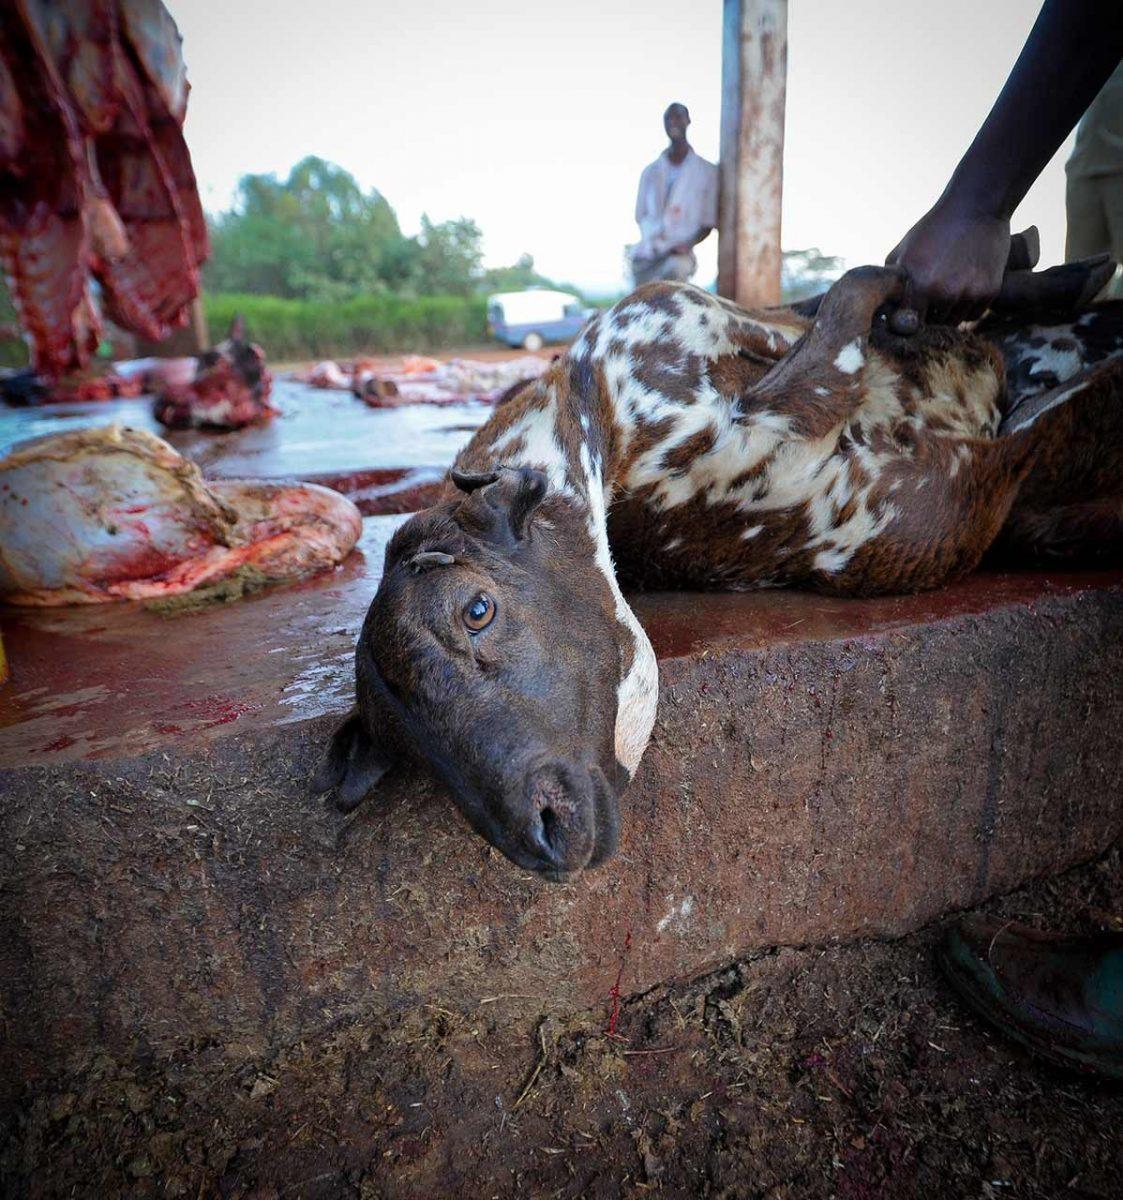 A goat at a slaughterhouse. Tanzania, 2011.